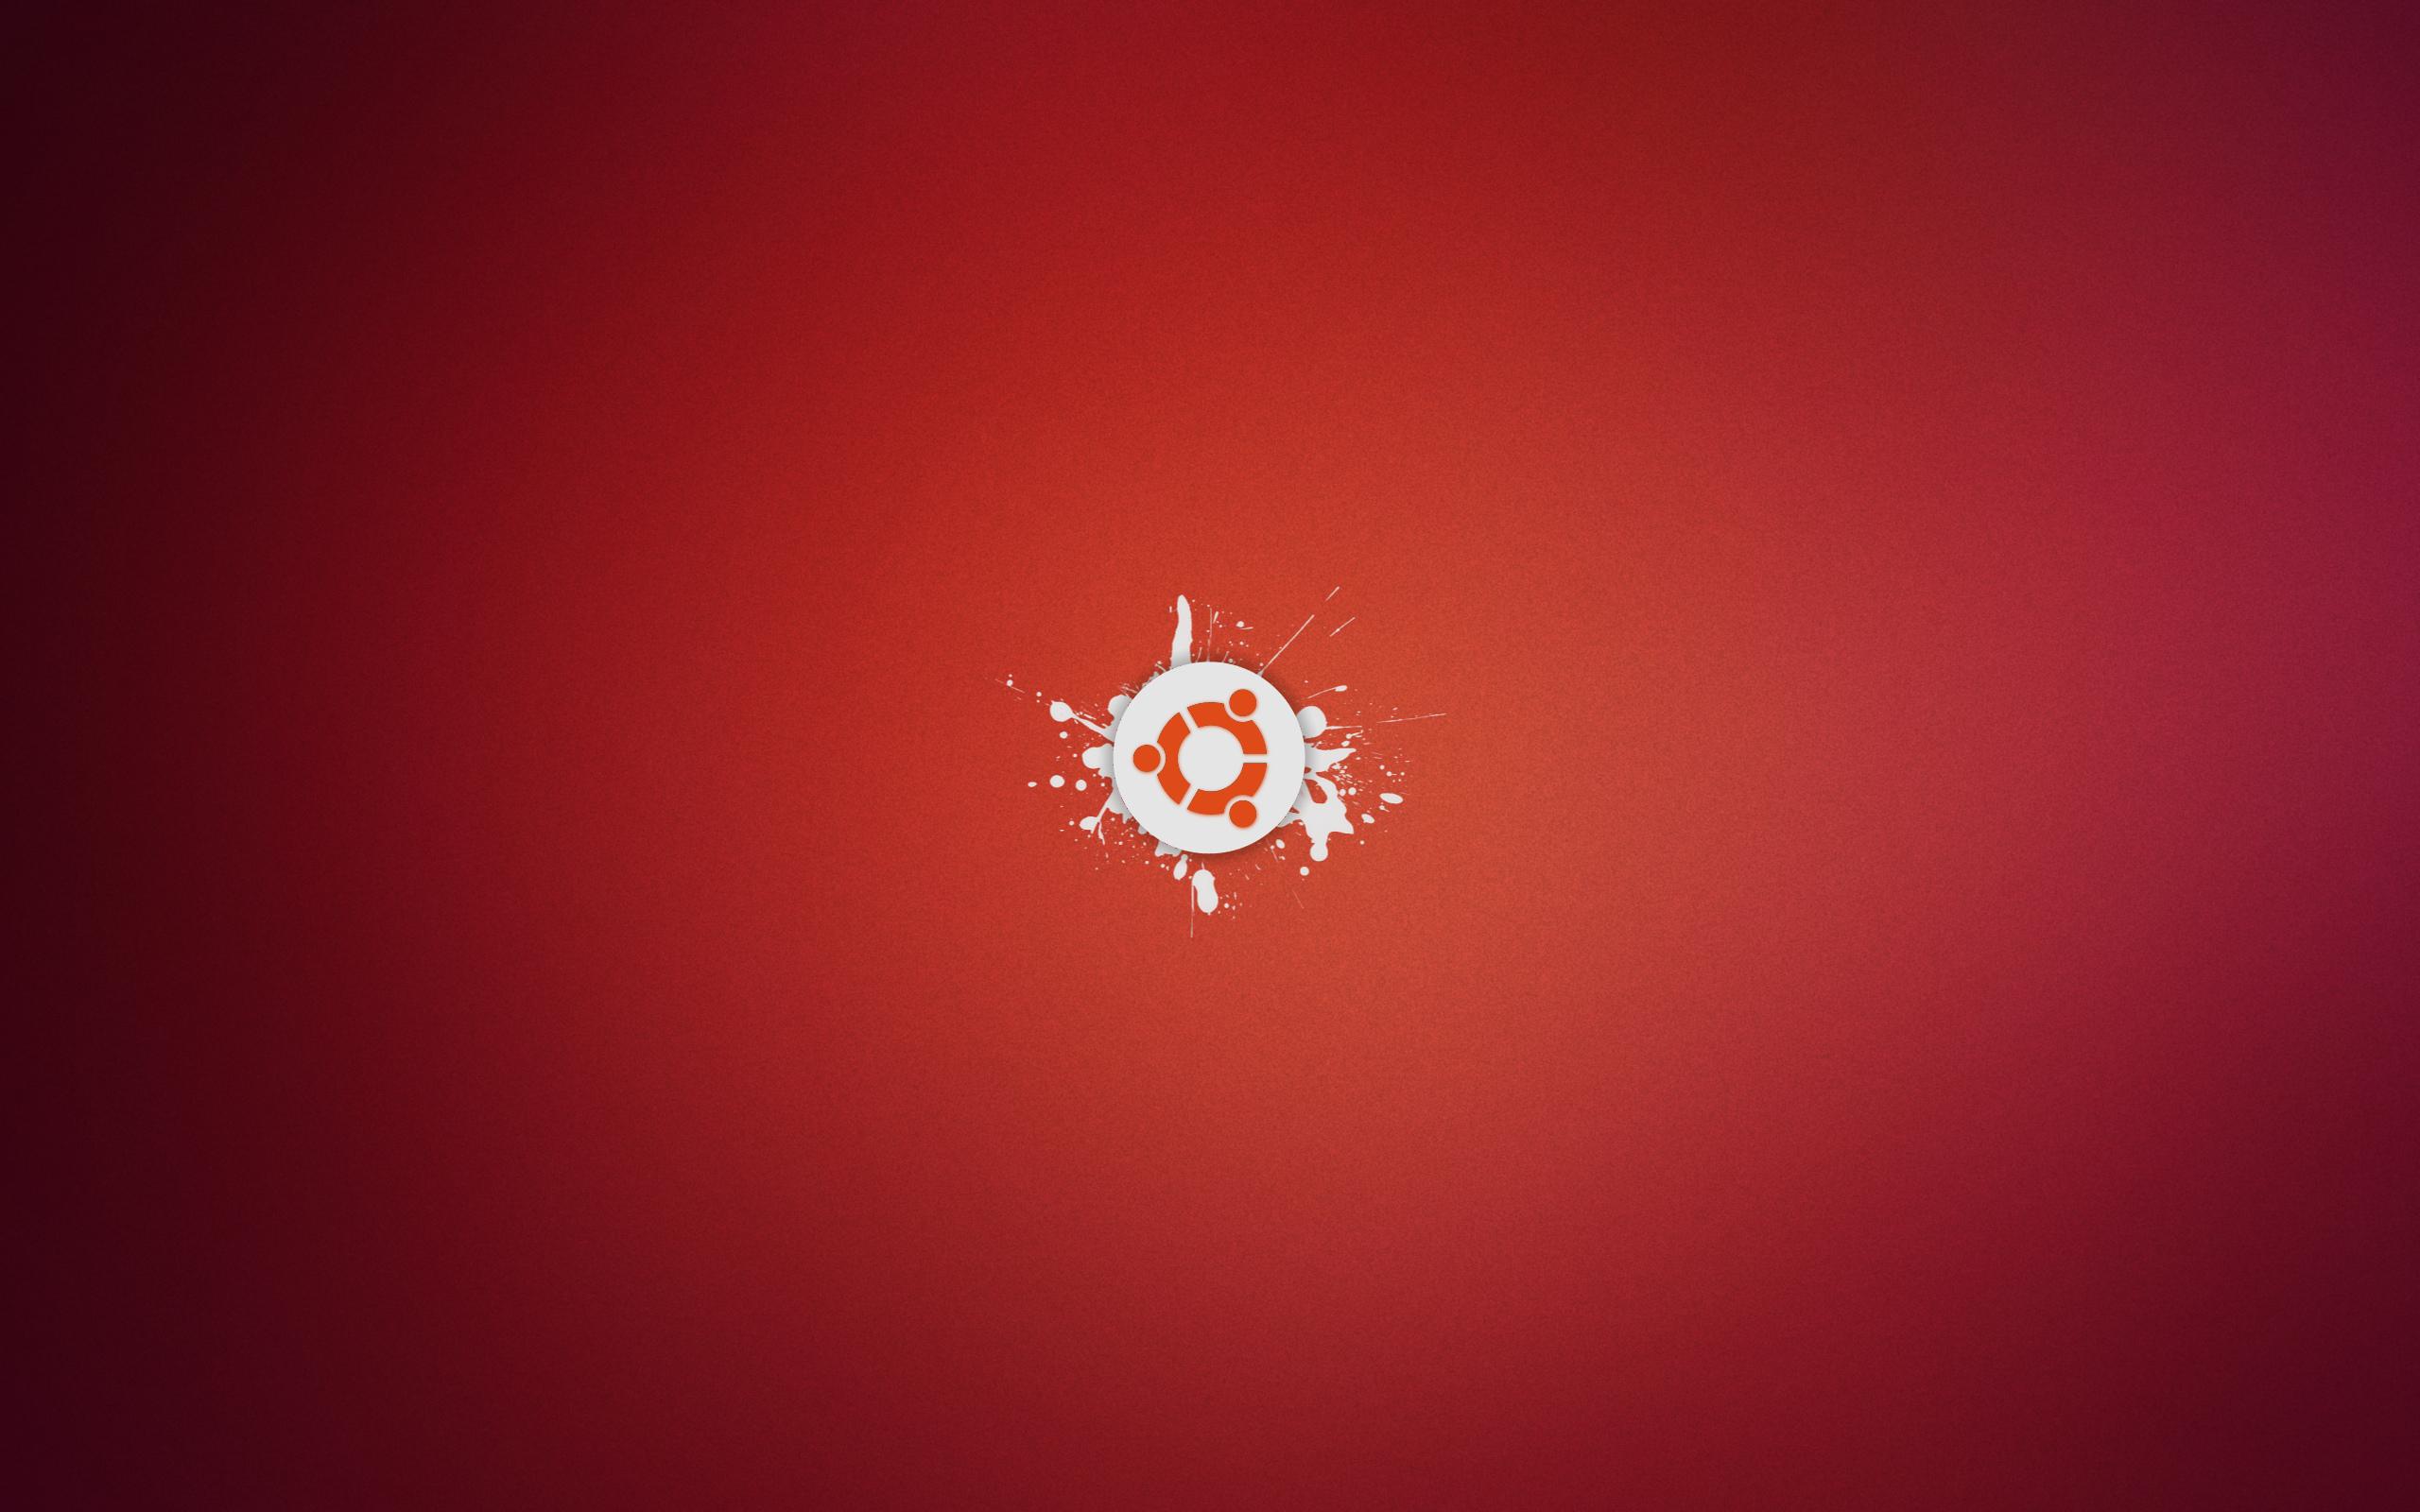 Linux Ubuntu Desktop Background newhairstylesformen2014com 2560x1600